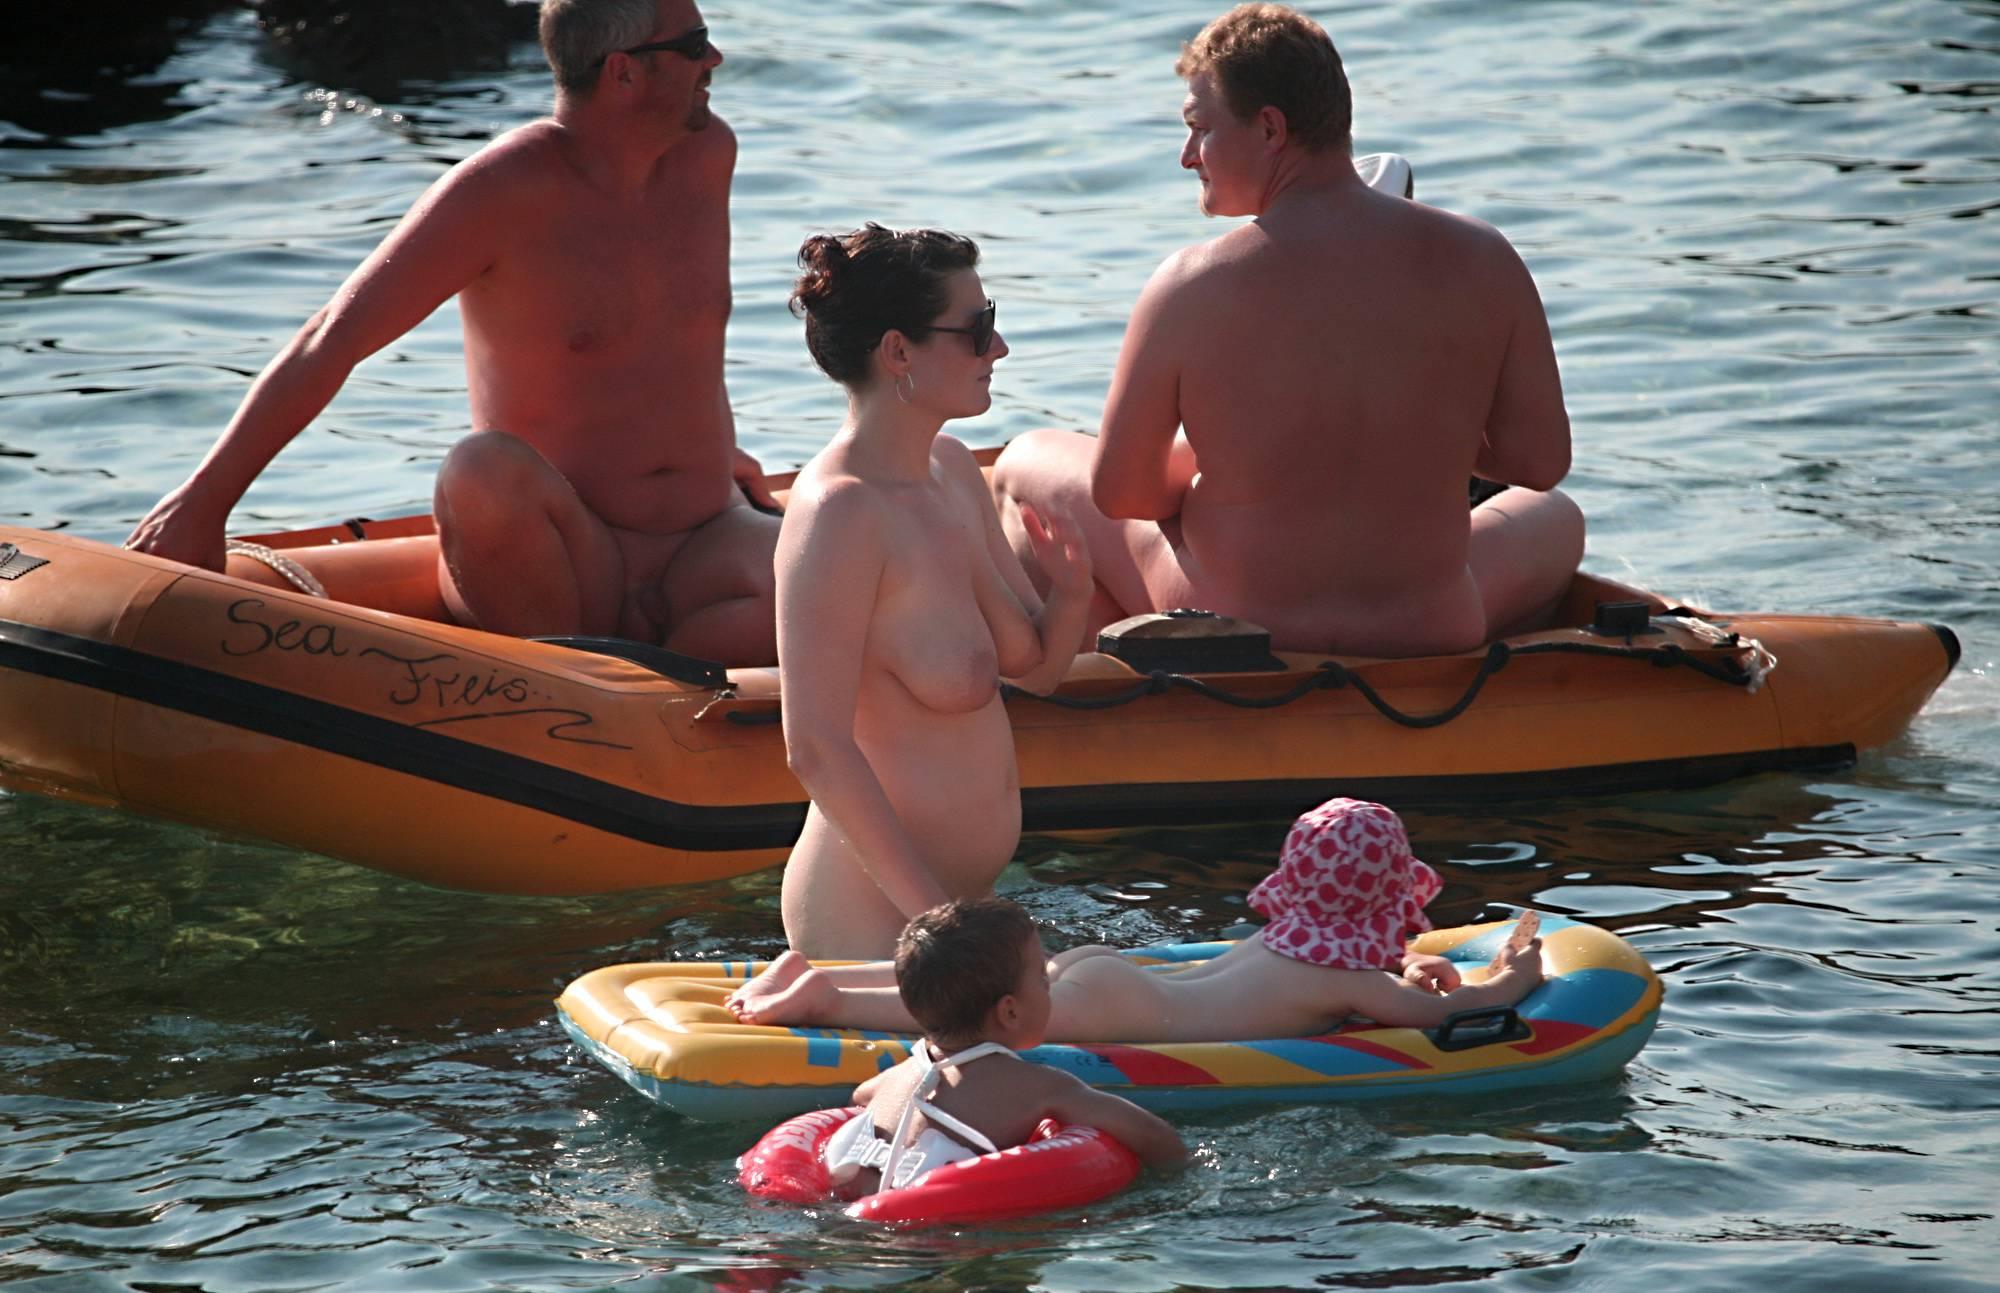 Full Family Nudist Boating - 1